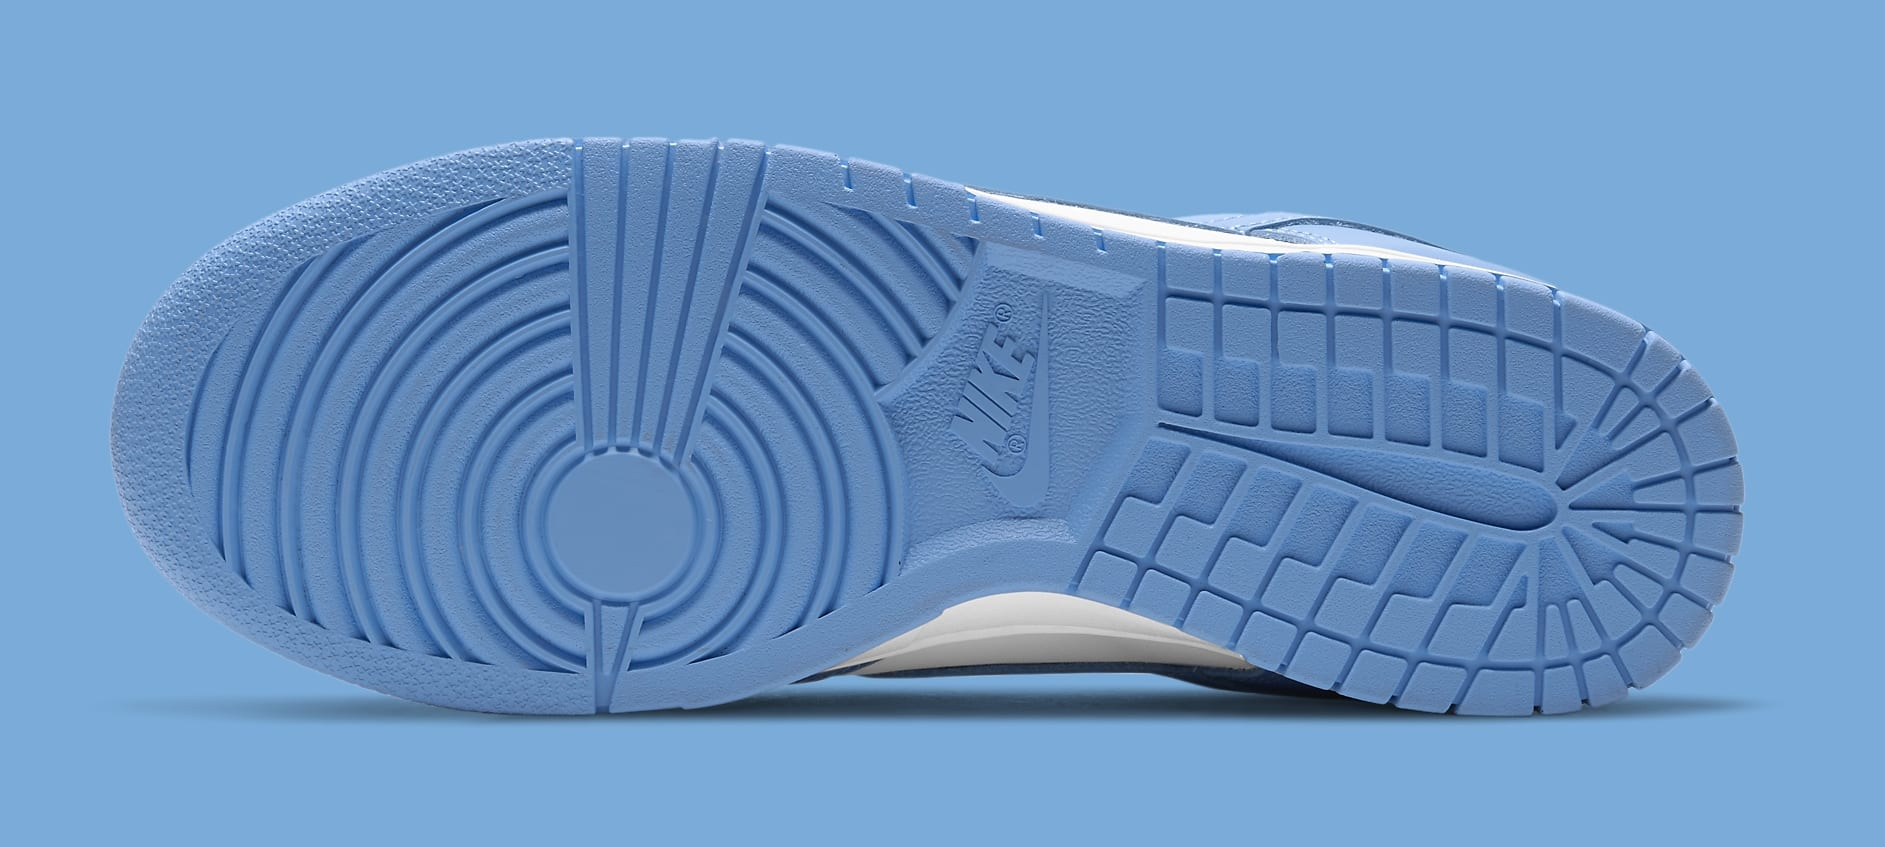 Nike Dunk Low 'University Blue' DD1391 102 Outsole